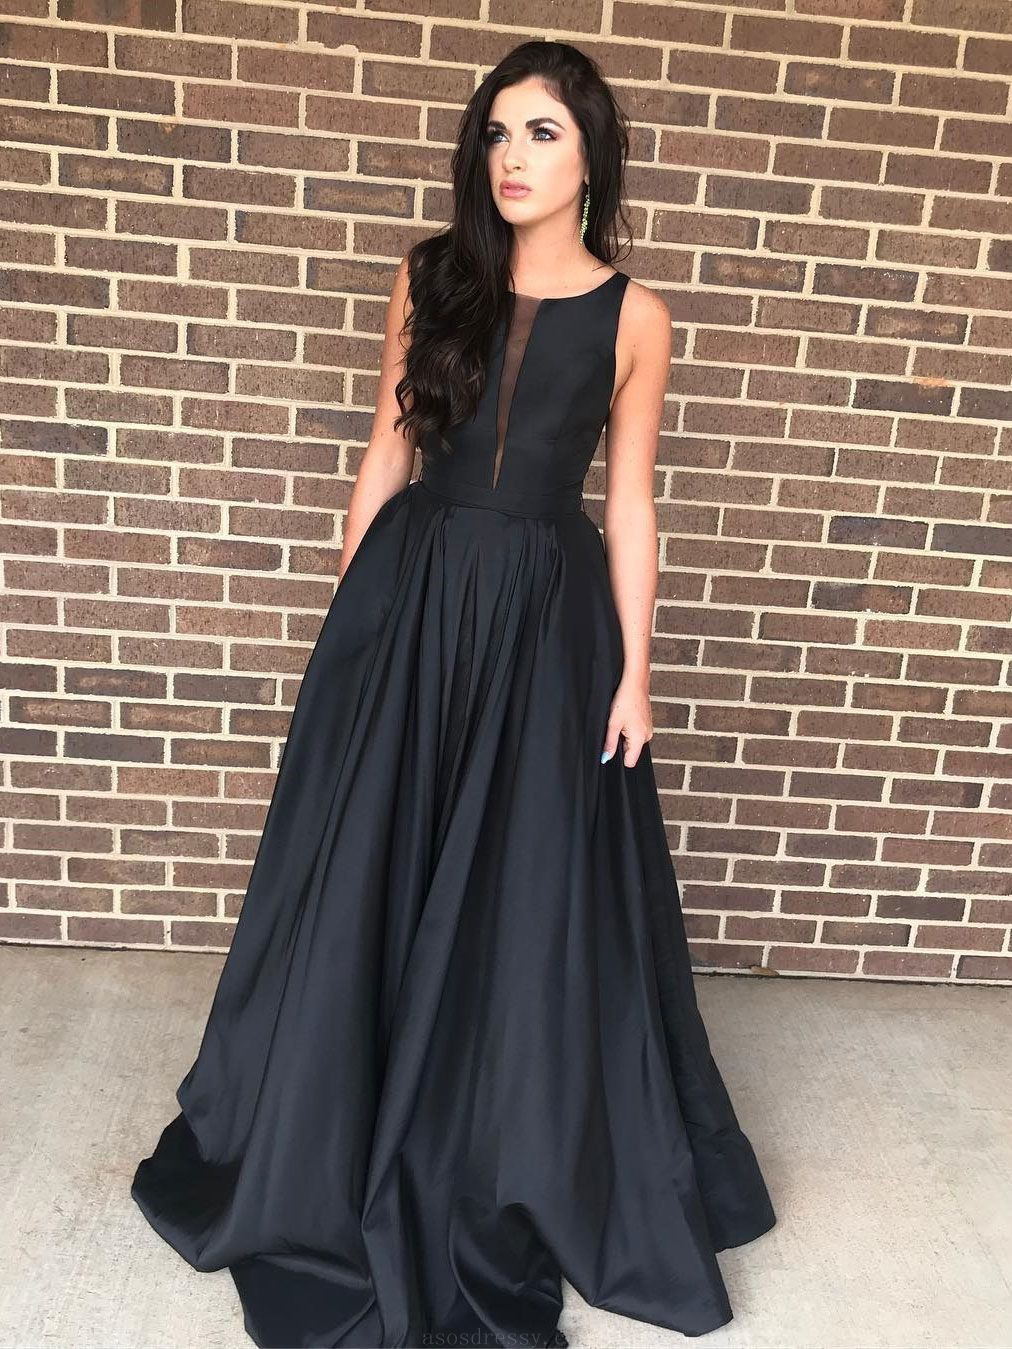 Trendy Long Prom Dresses Prom Dresses Black Prom Dresses Cheap